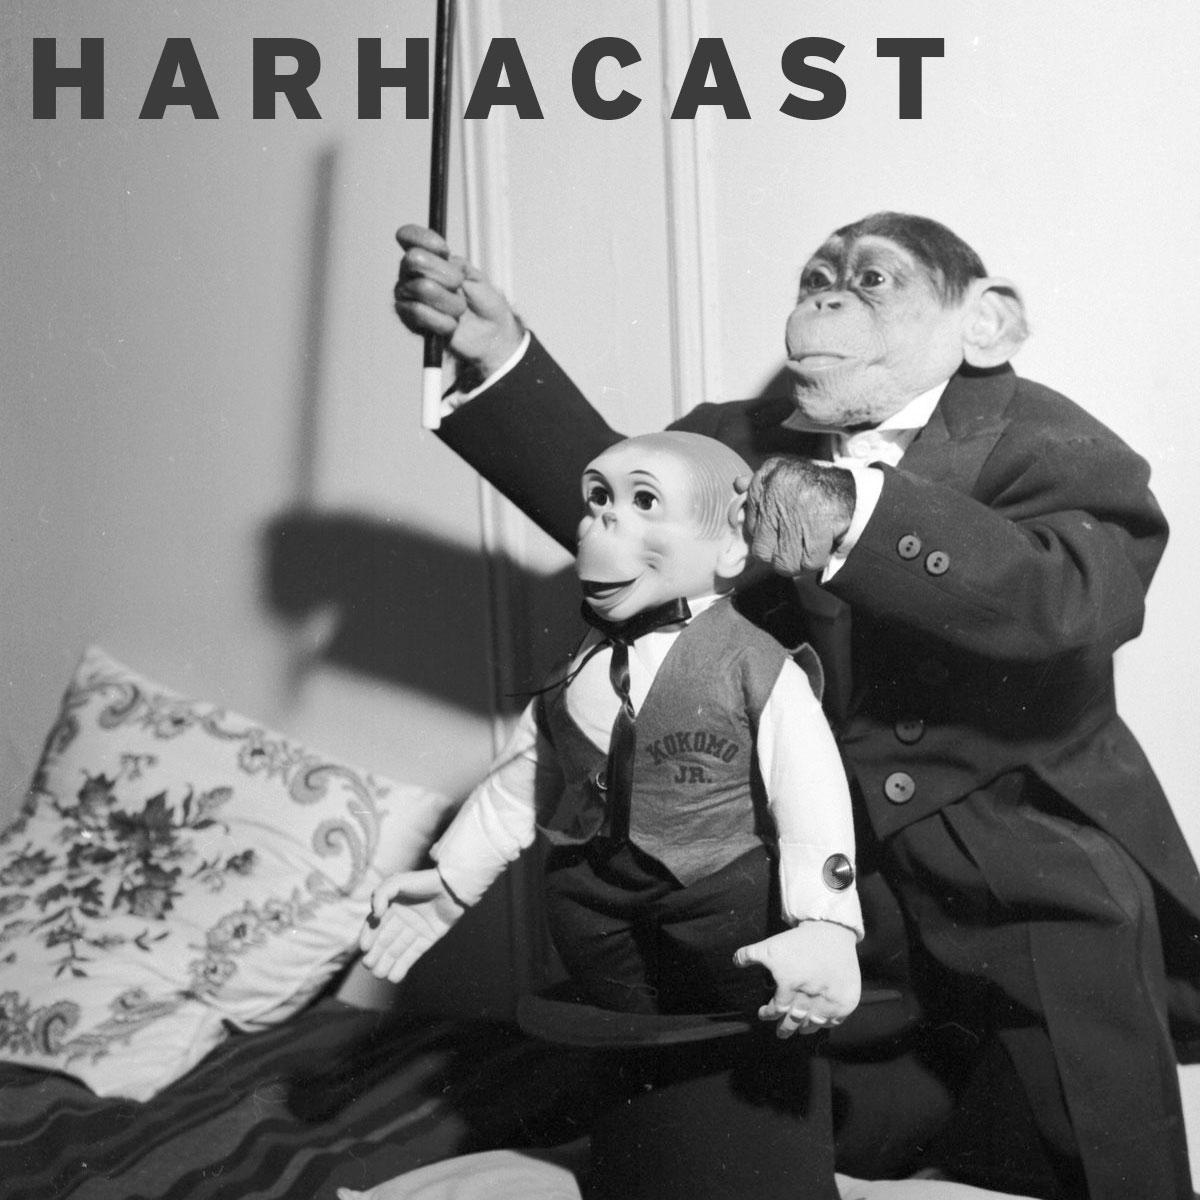 HarhaCast - Club Harha